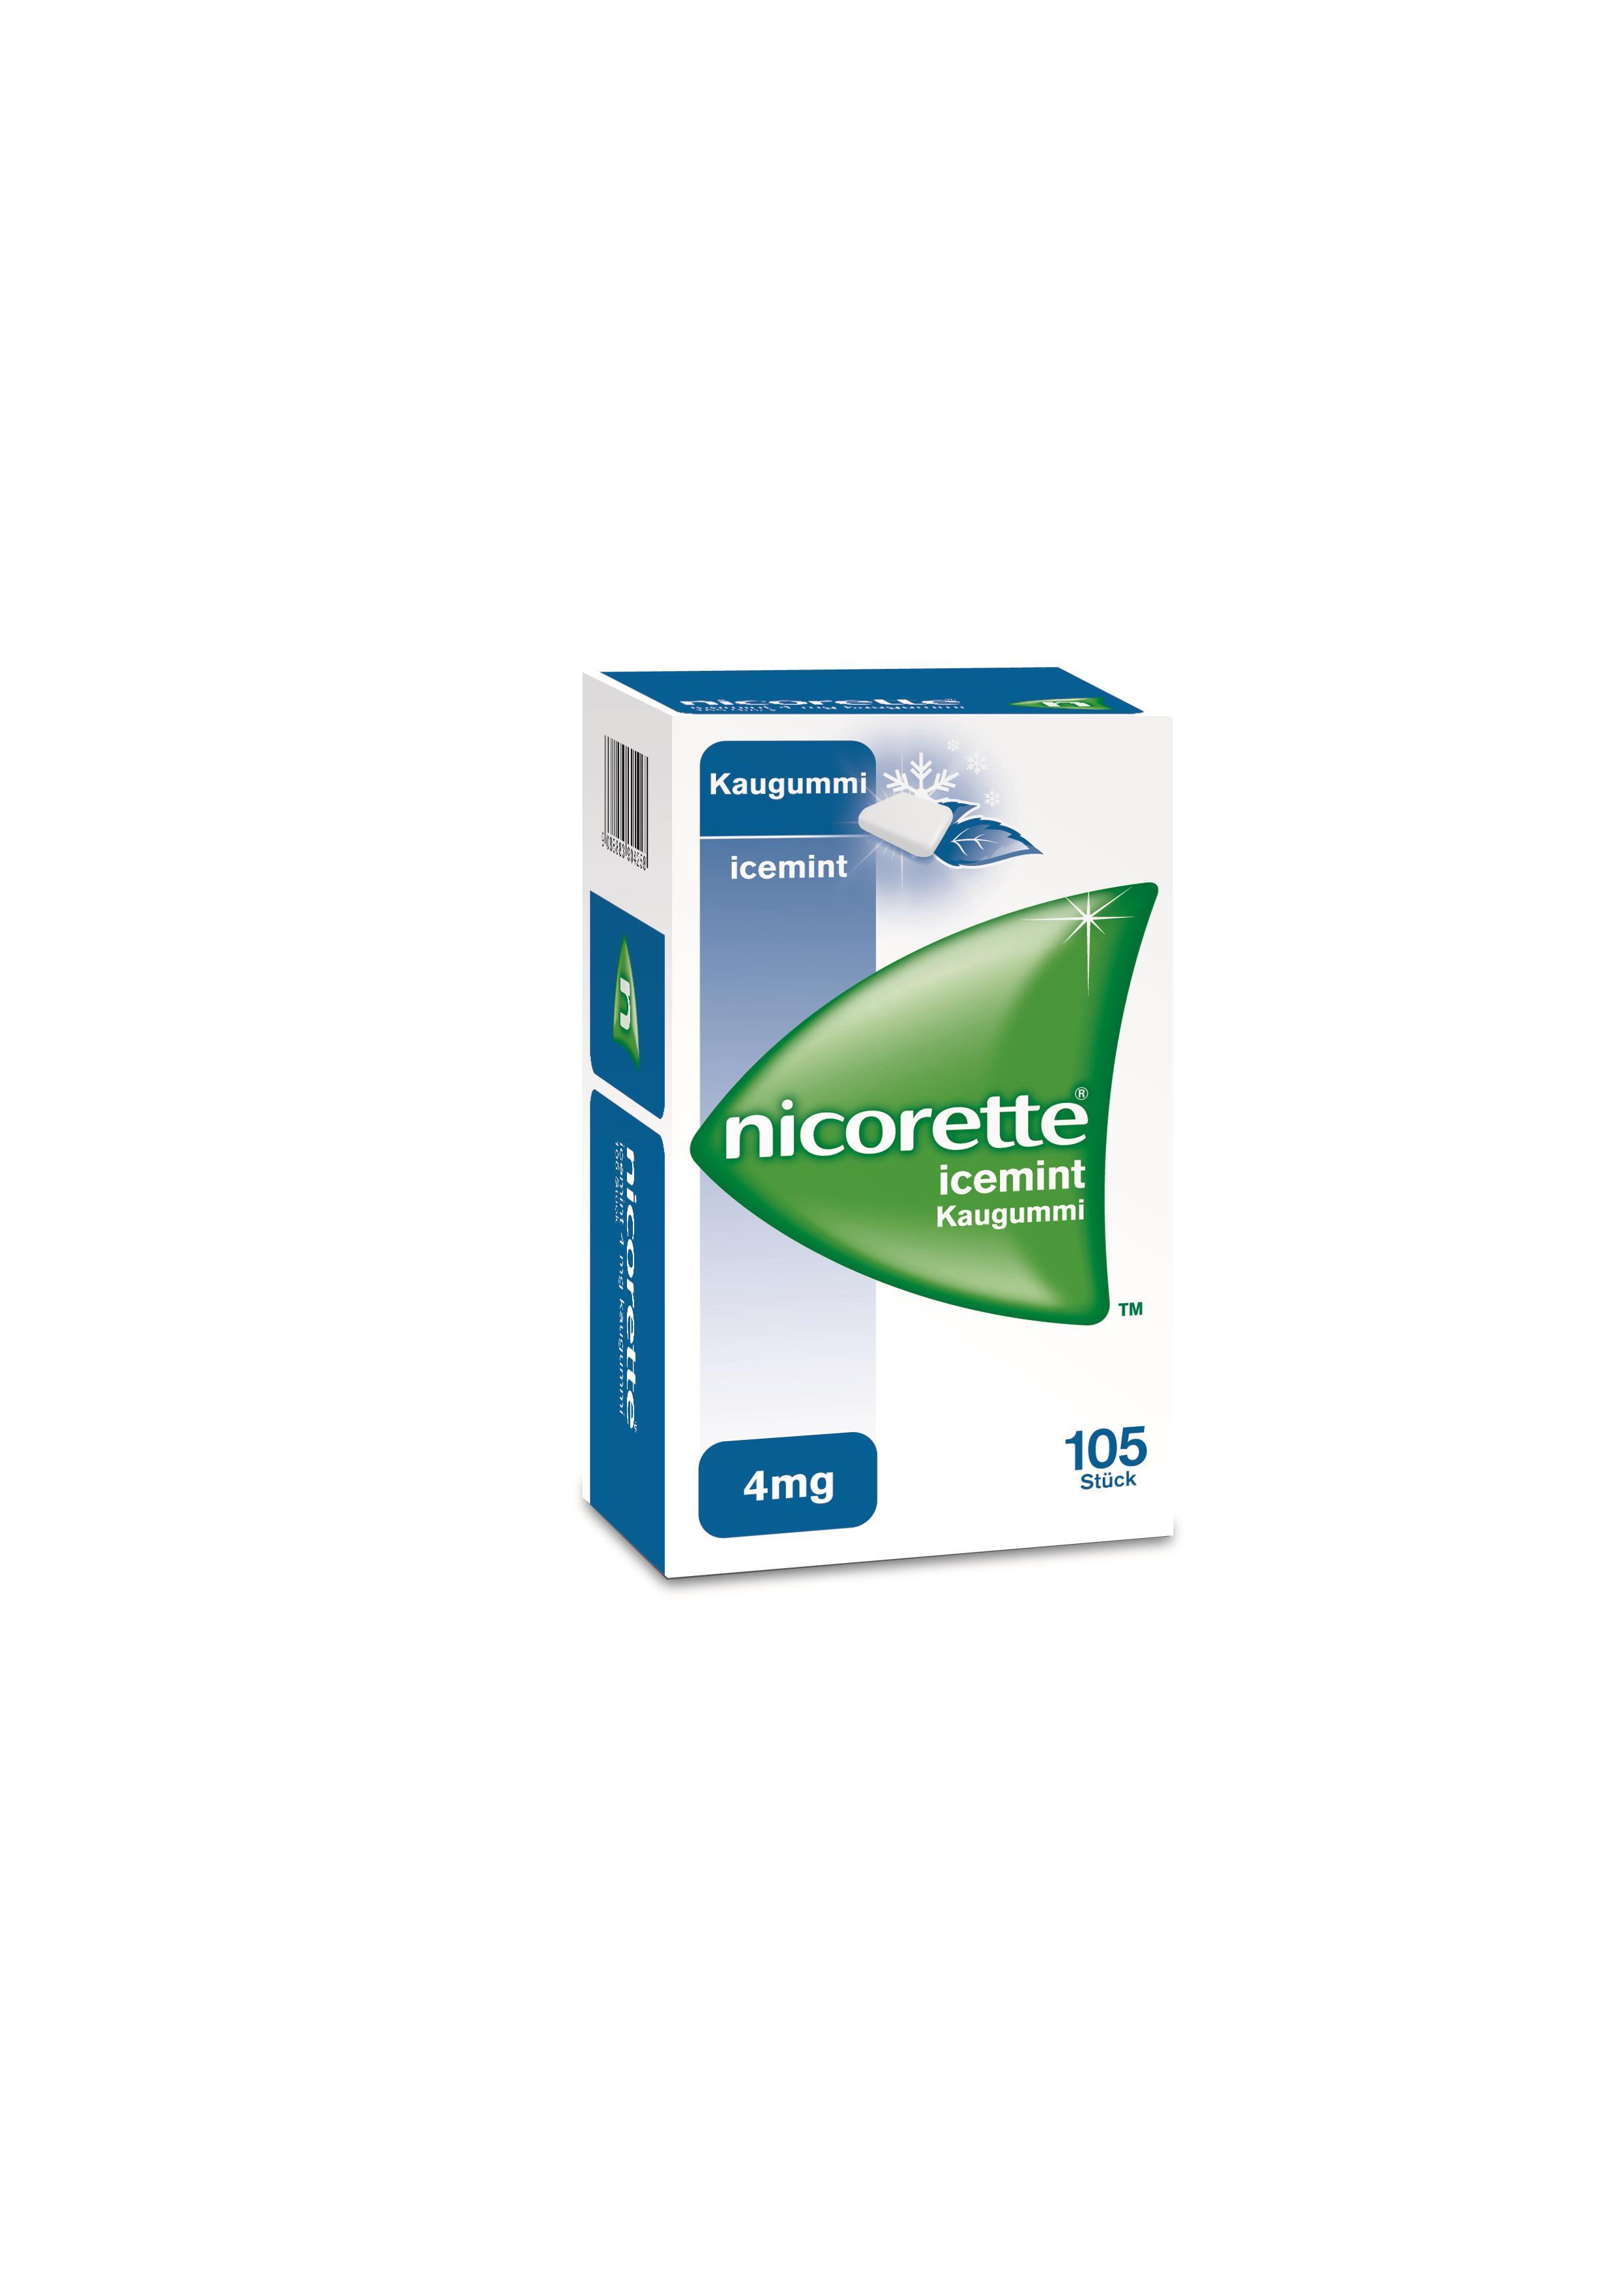 Nicorette Icemint 4 mg - Kaugummi zur Raucherentwöhnung